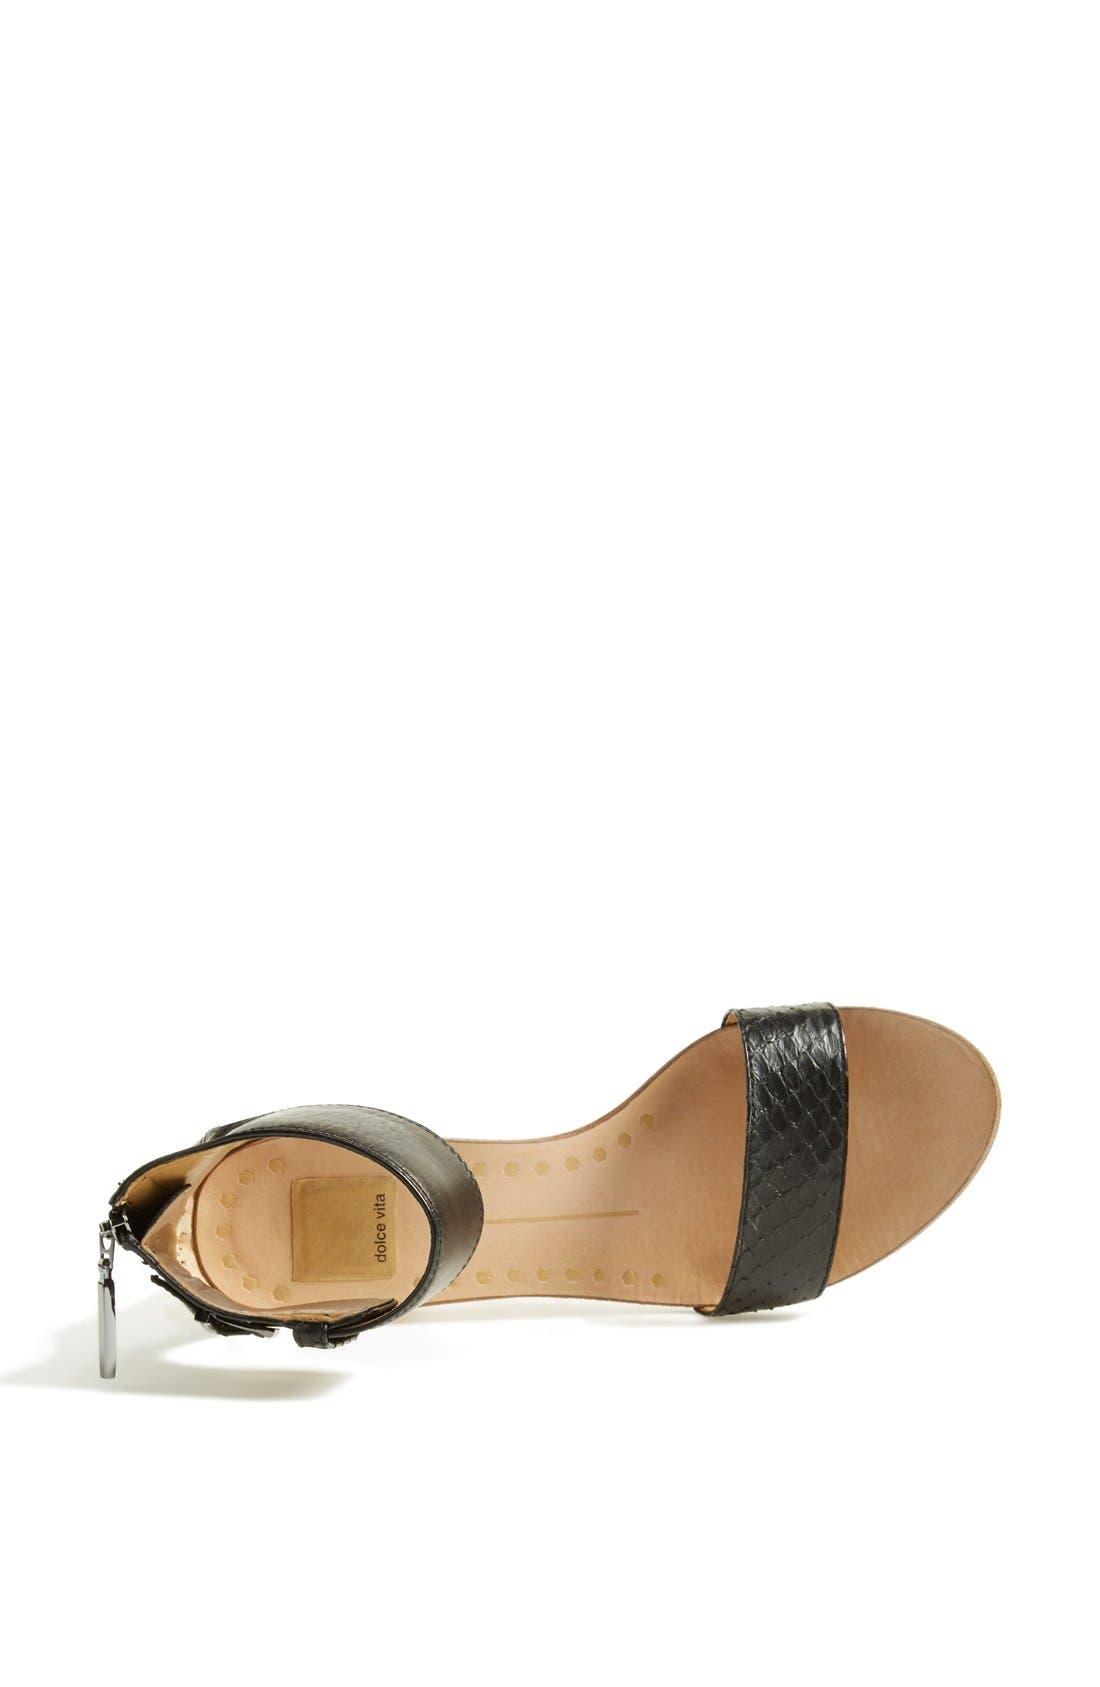 Alternate Image 3  - Dolce Vita 'Foxie' Snakeskin & Leather Sandal